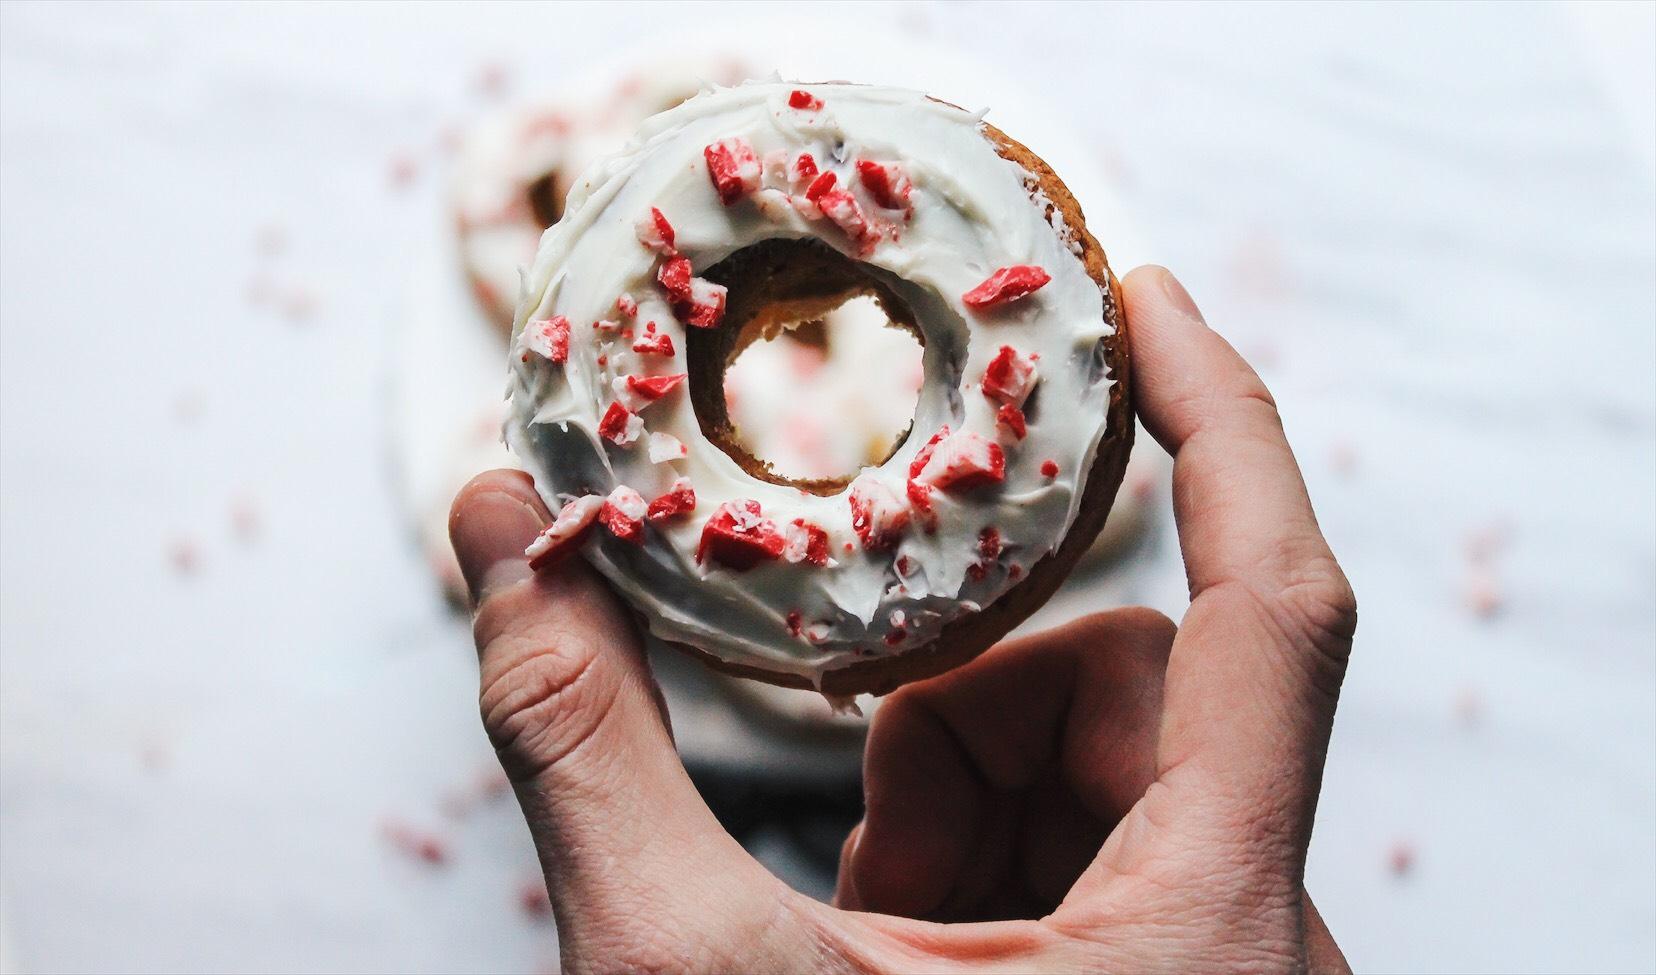 donut in hand